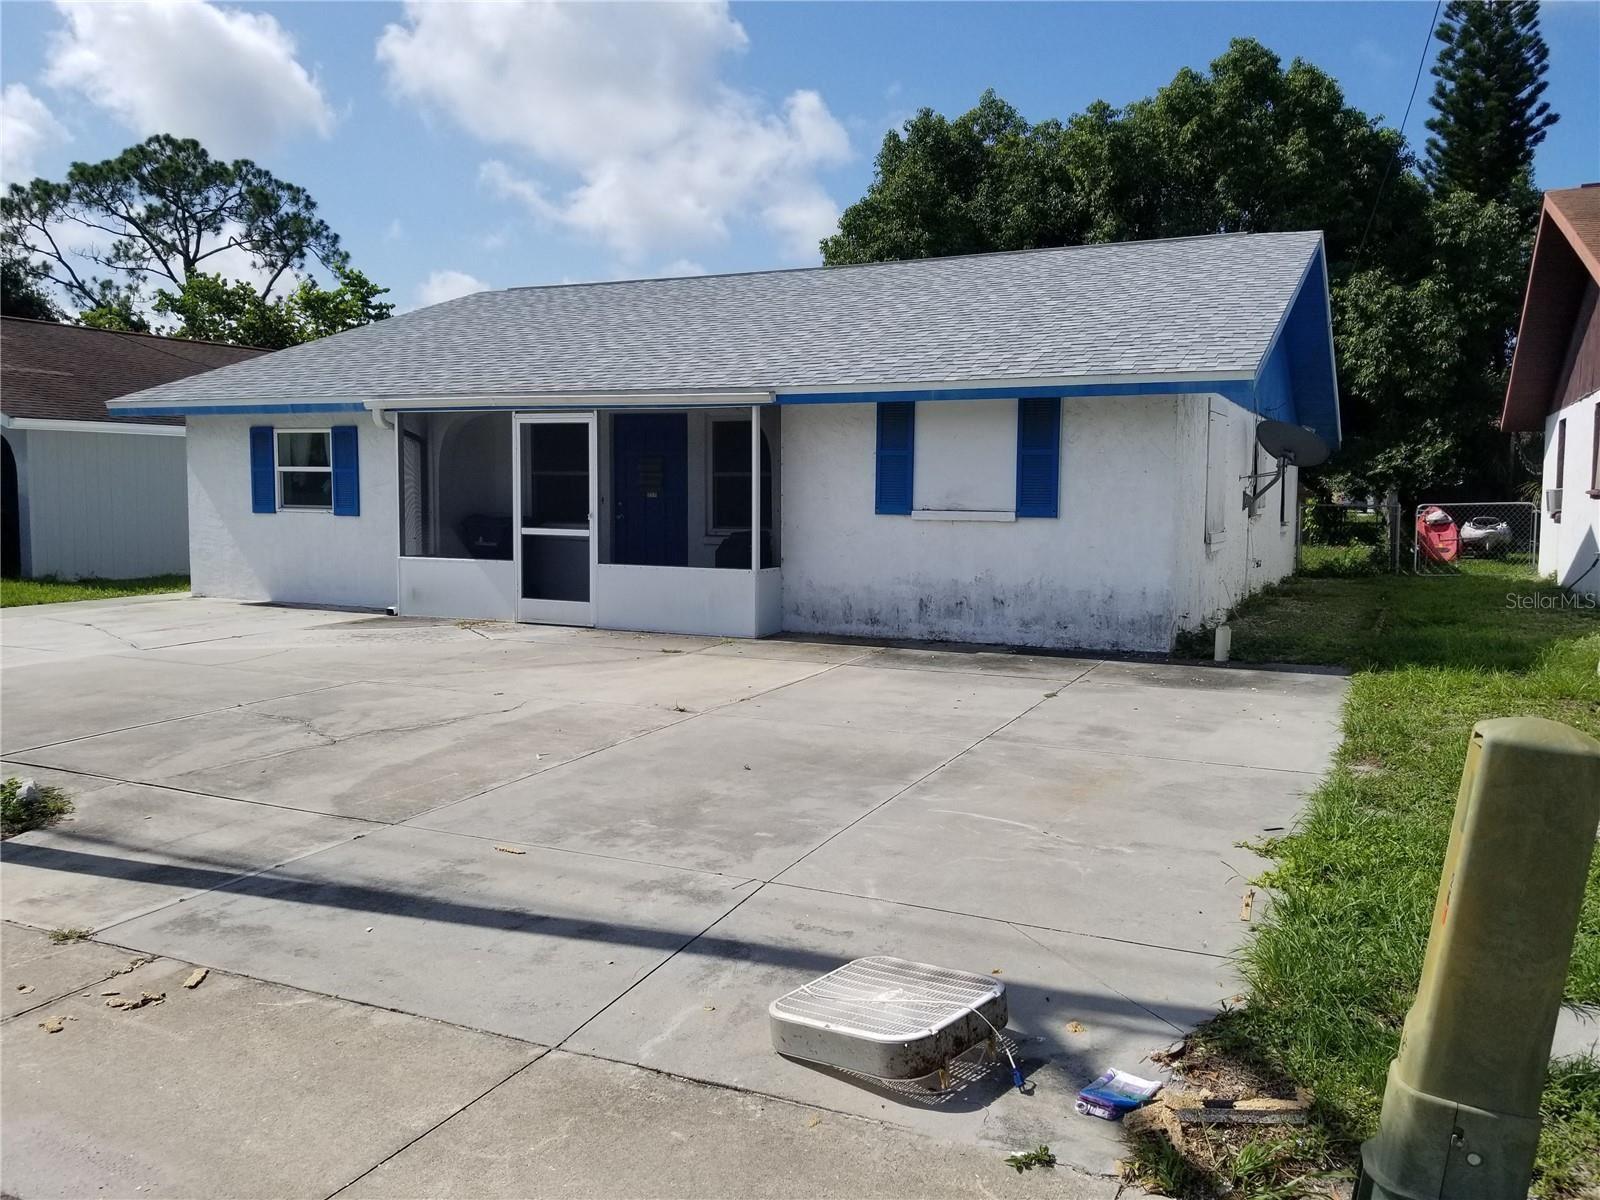 Photo of 261 E DEARBORN STREET, ENGLEWOOD, FL 34223 (MLS # C7445729)